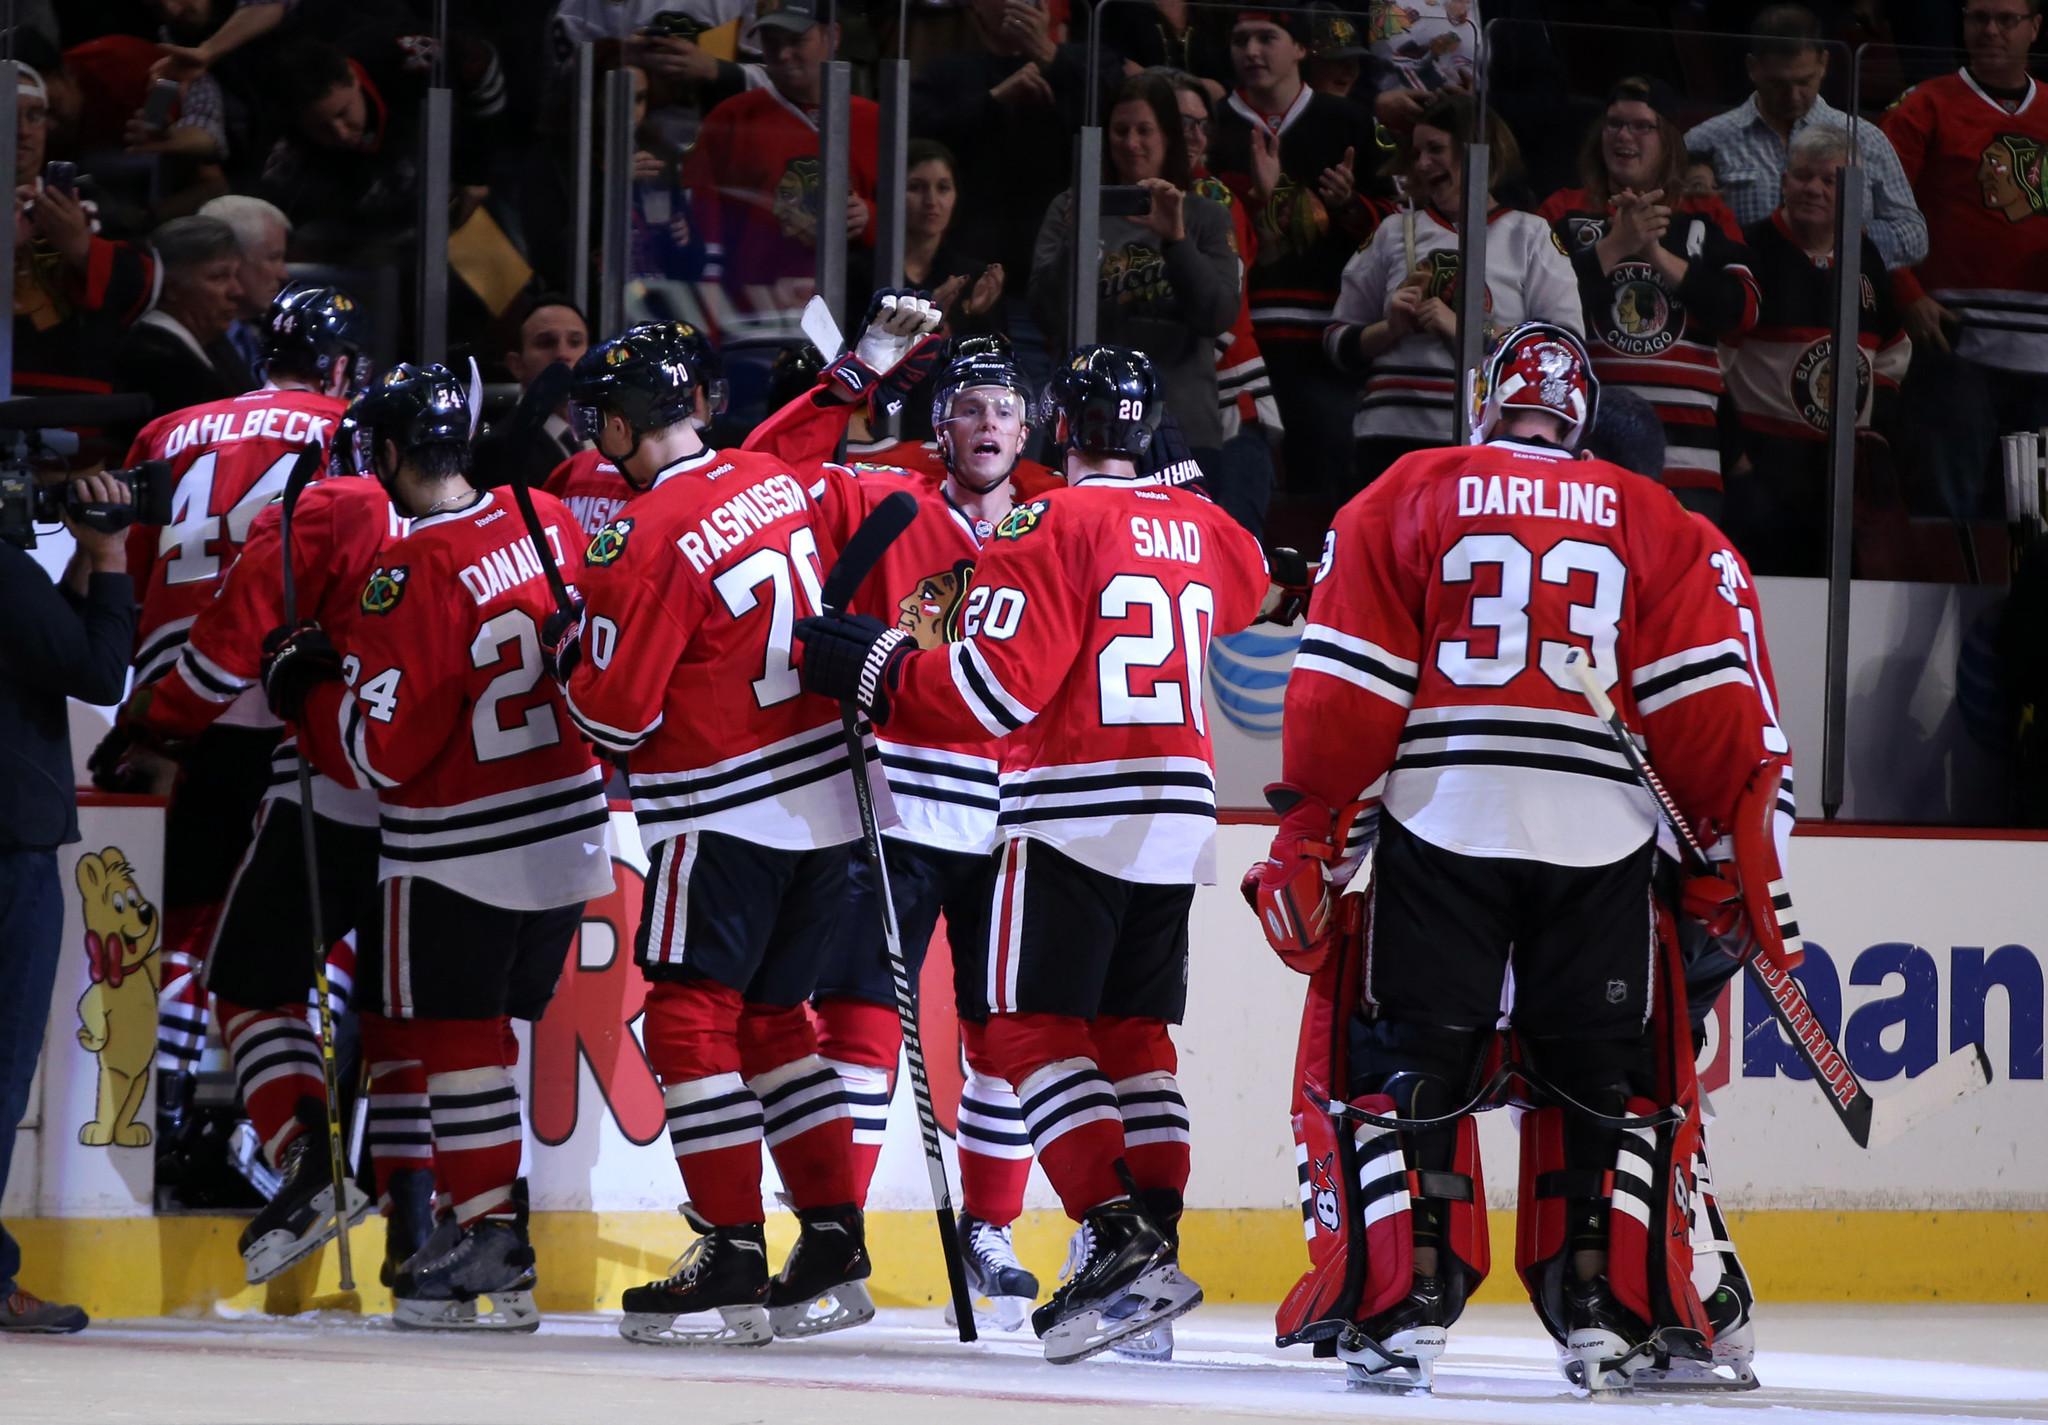 Blackhawks top Red Wings 2-1 in OT in exhibition opener